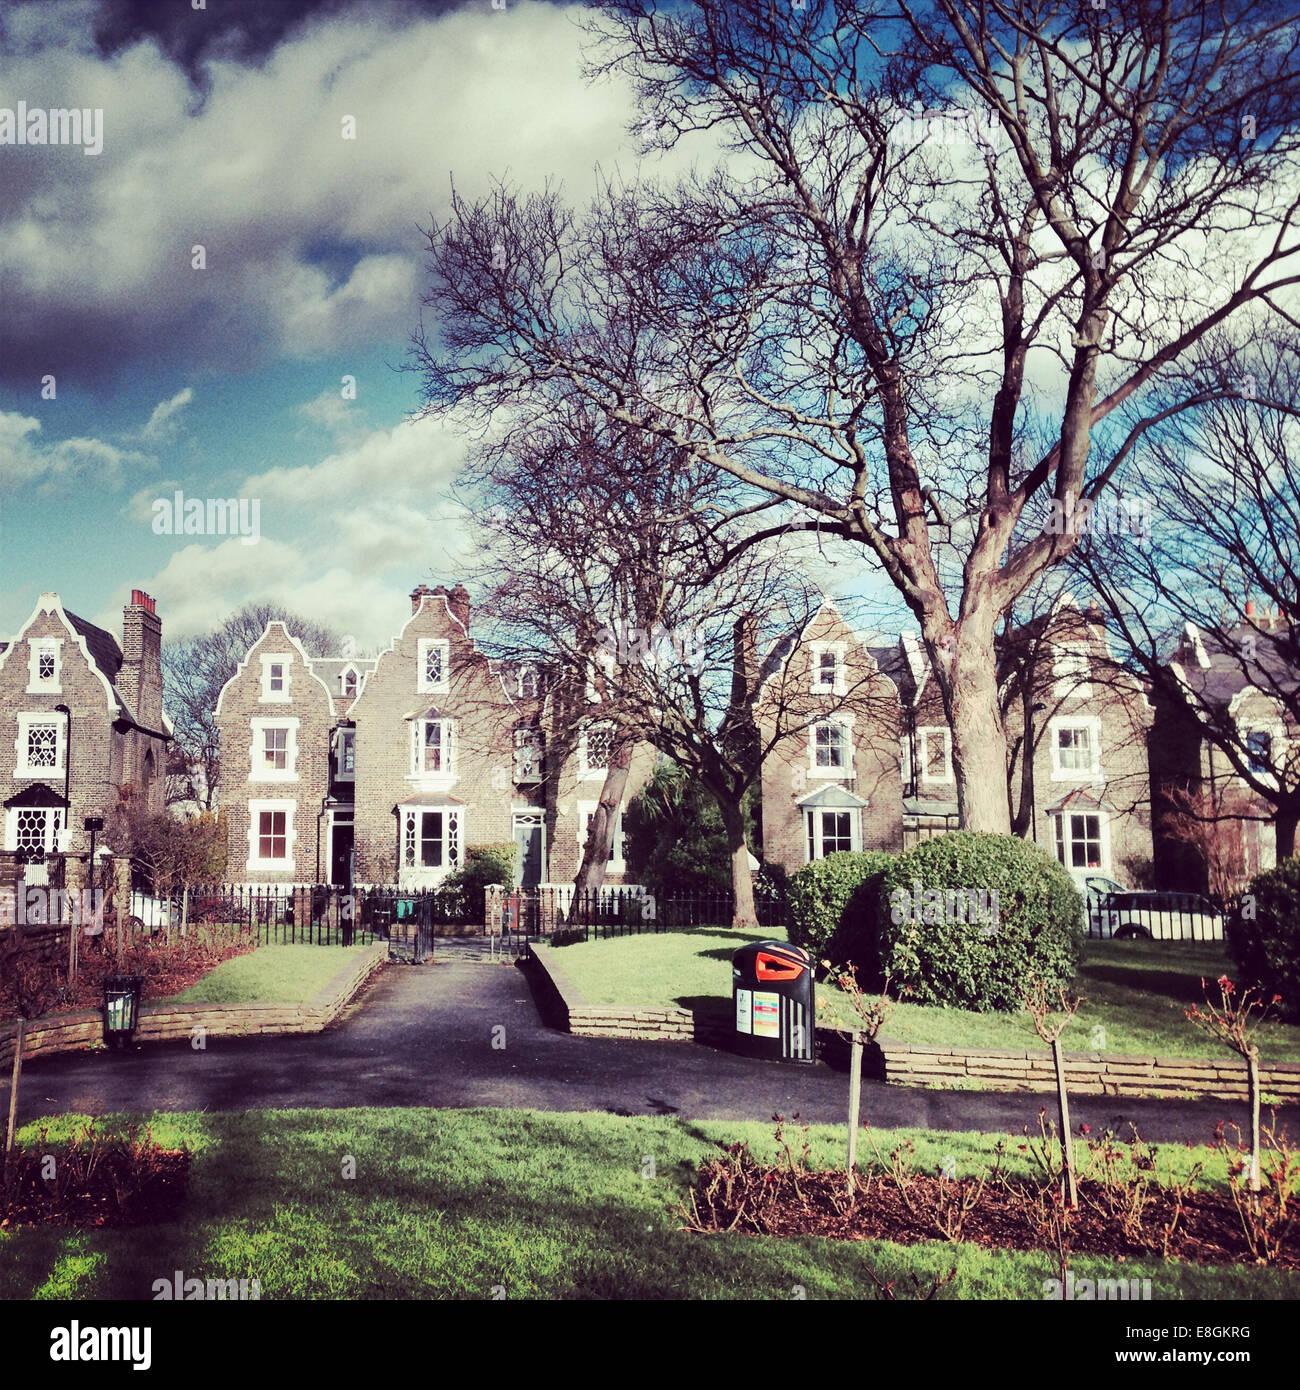 UK, London, Borough of Hackney, De Beauvoir Town and Islington park, Houses - Stock Image